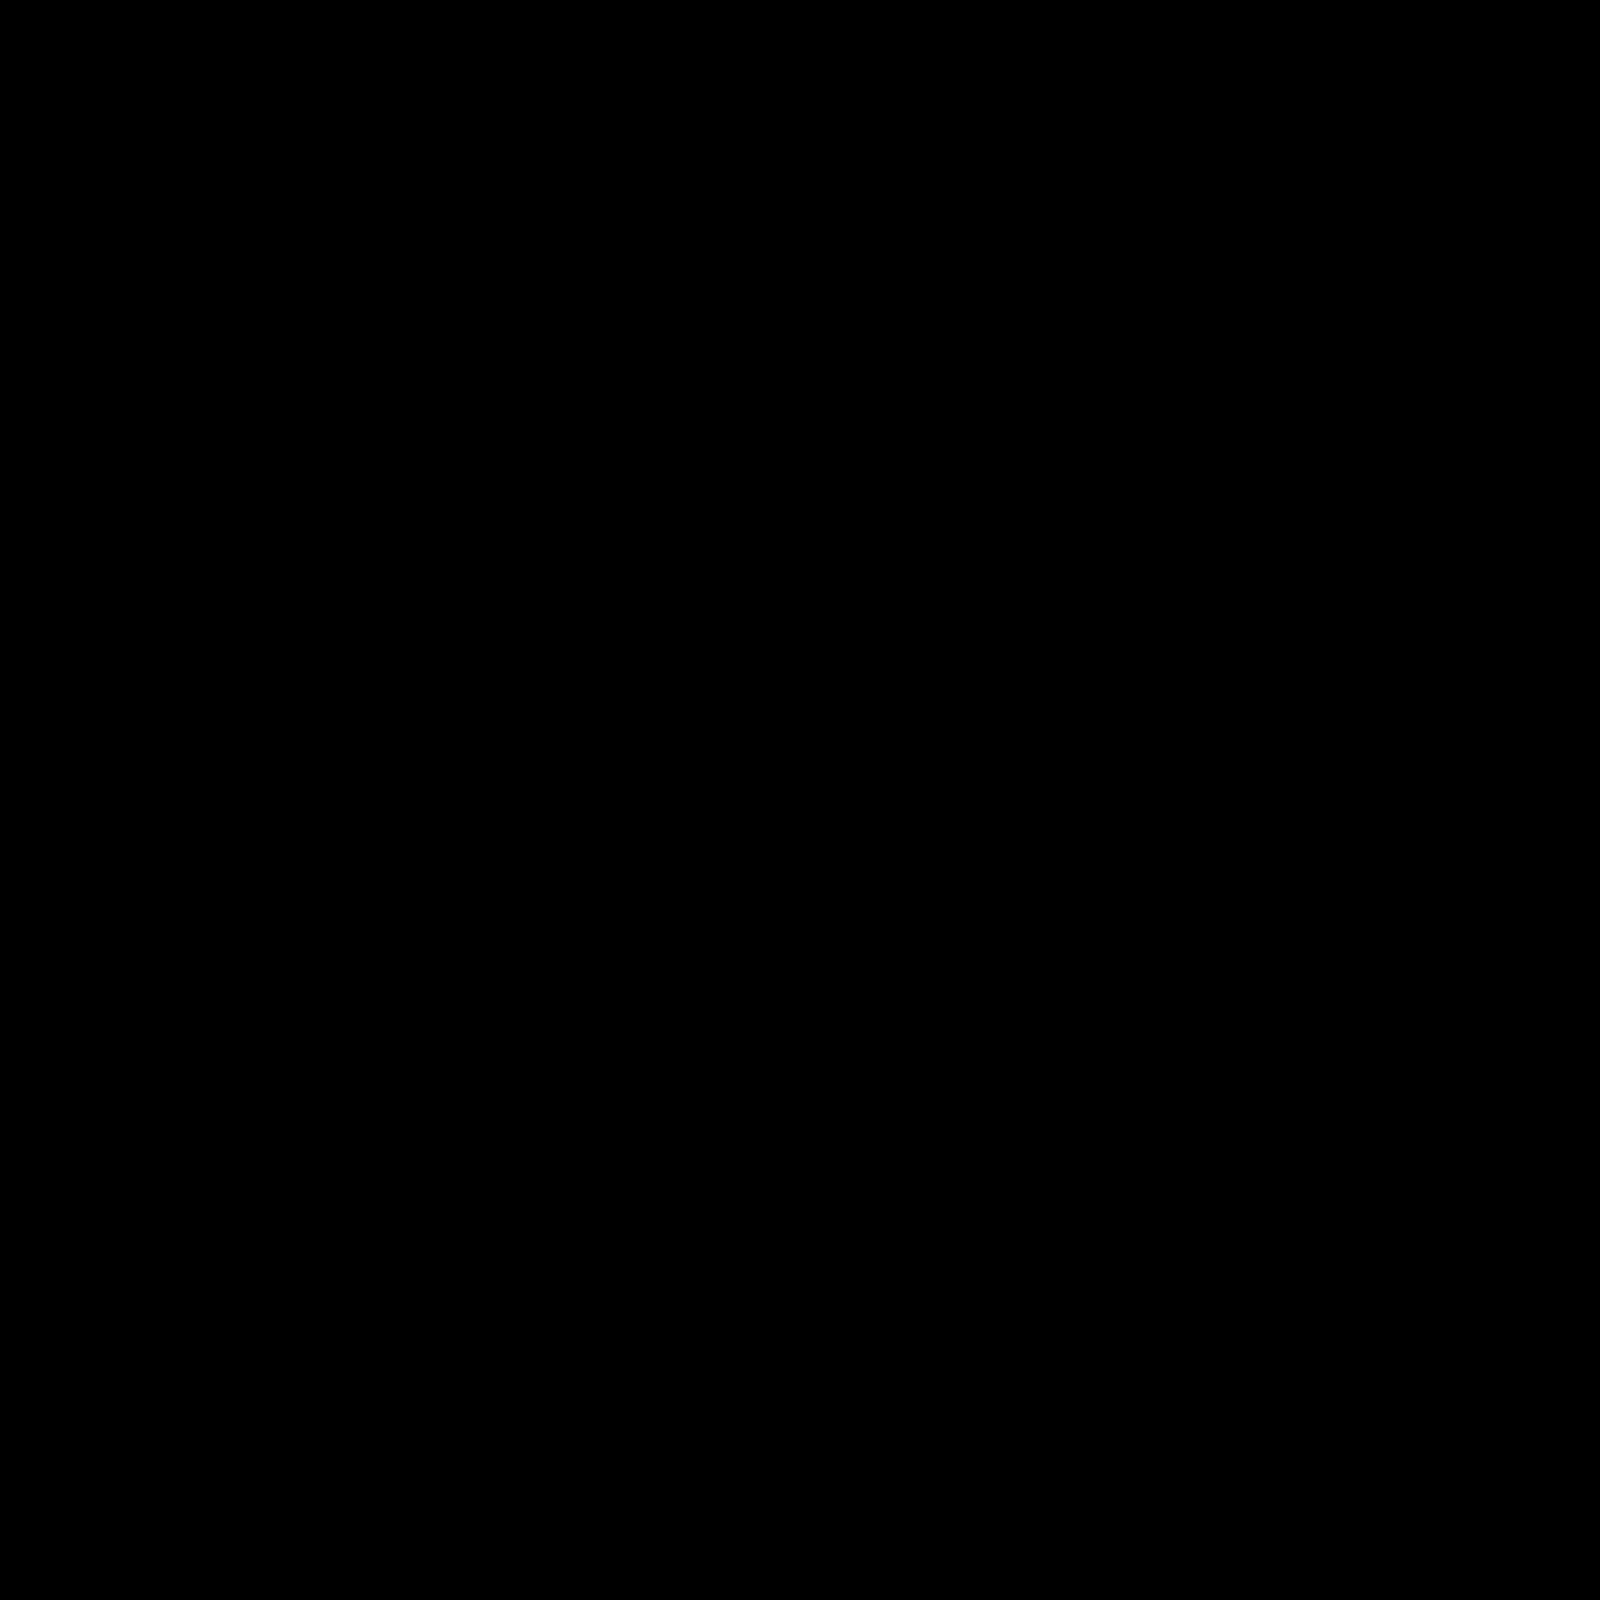 Śruba icon